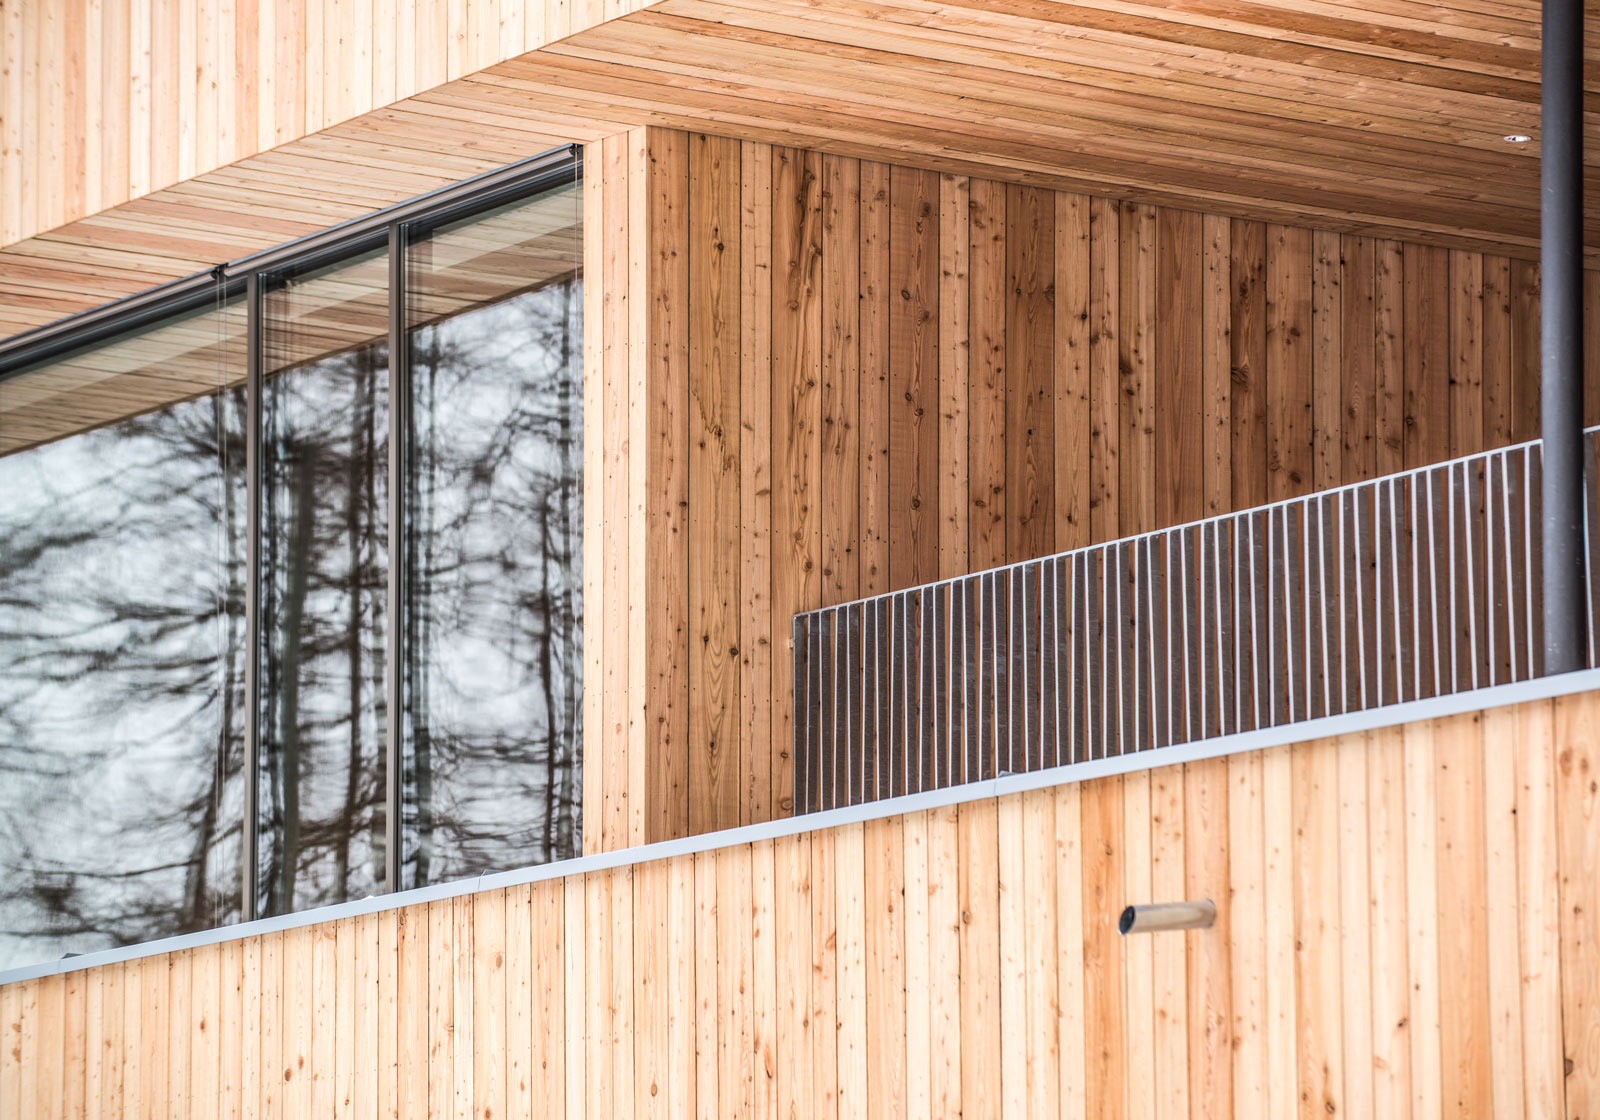 The untreated façade of larchwood planks. Photo: ATP/Philipp